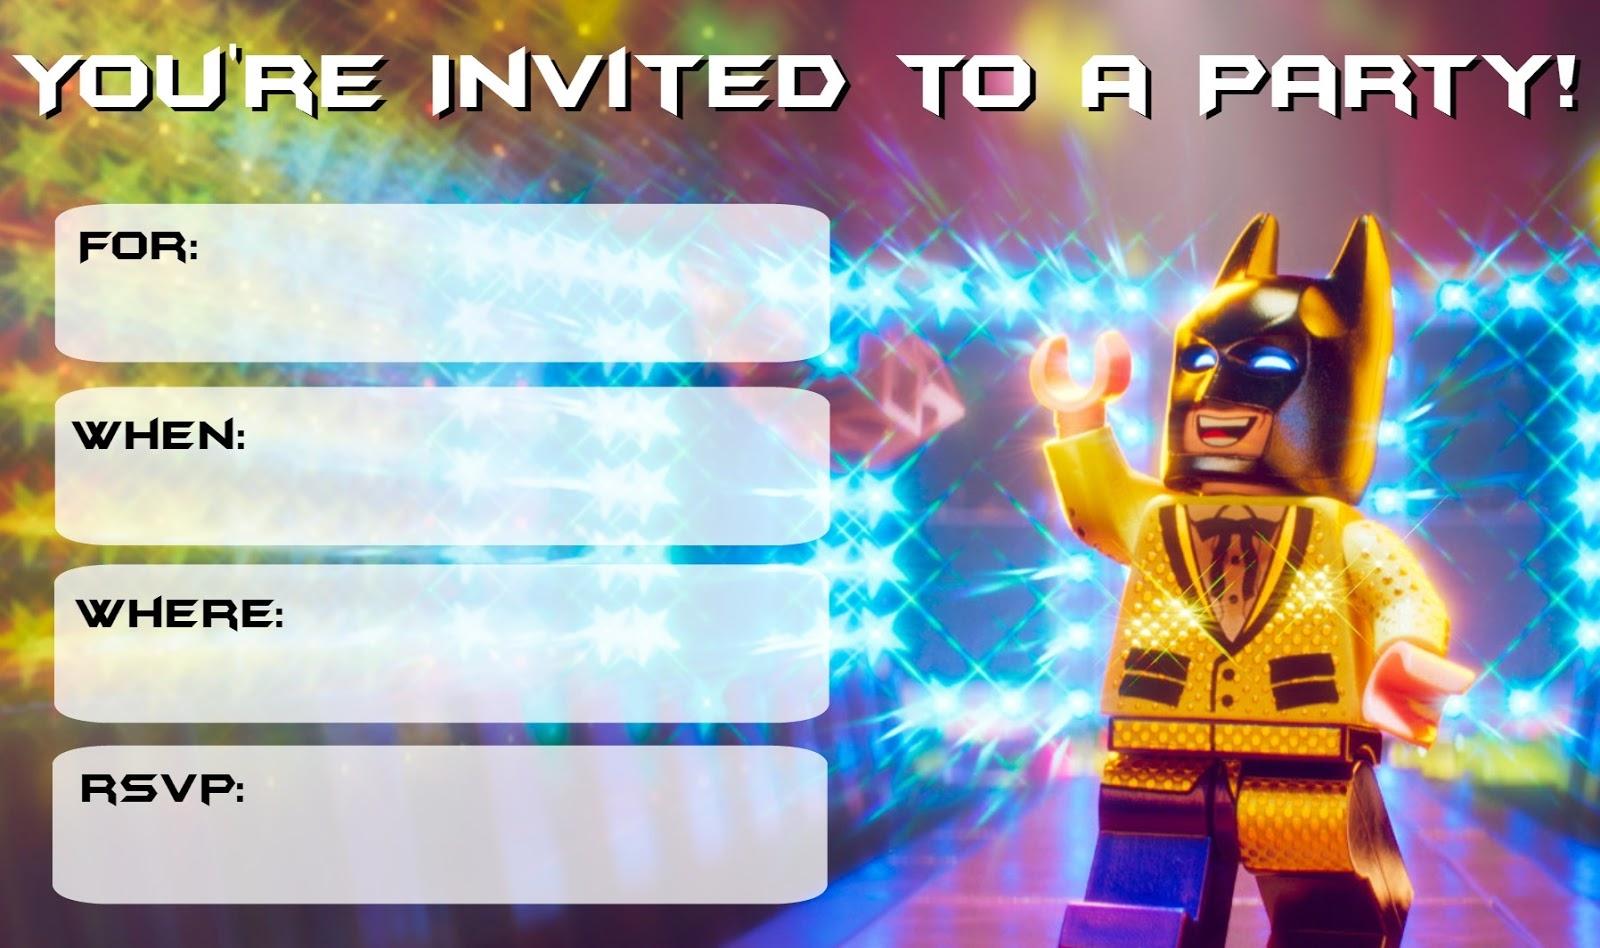 Musings Of An Average Mom Lego Batman Movie Party Invitations With - Lego Batman Invitations Free Printable